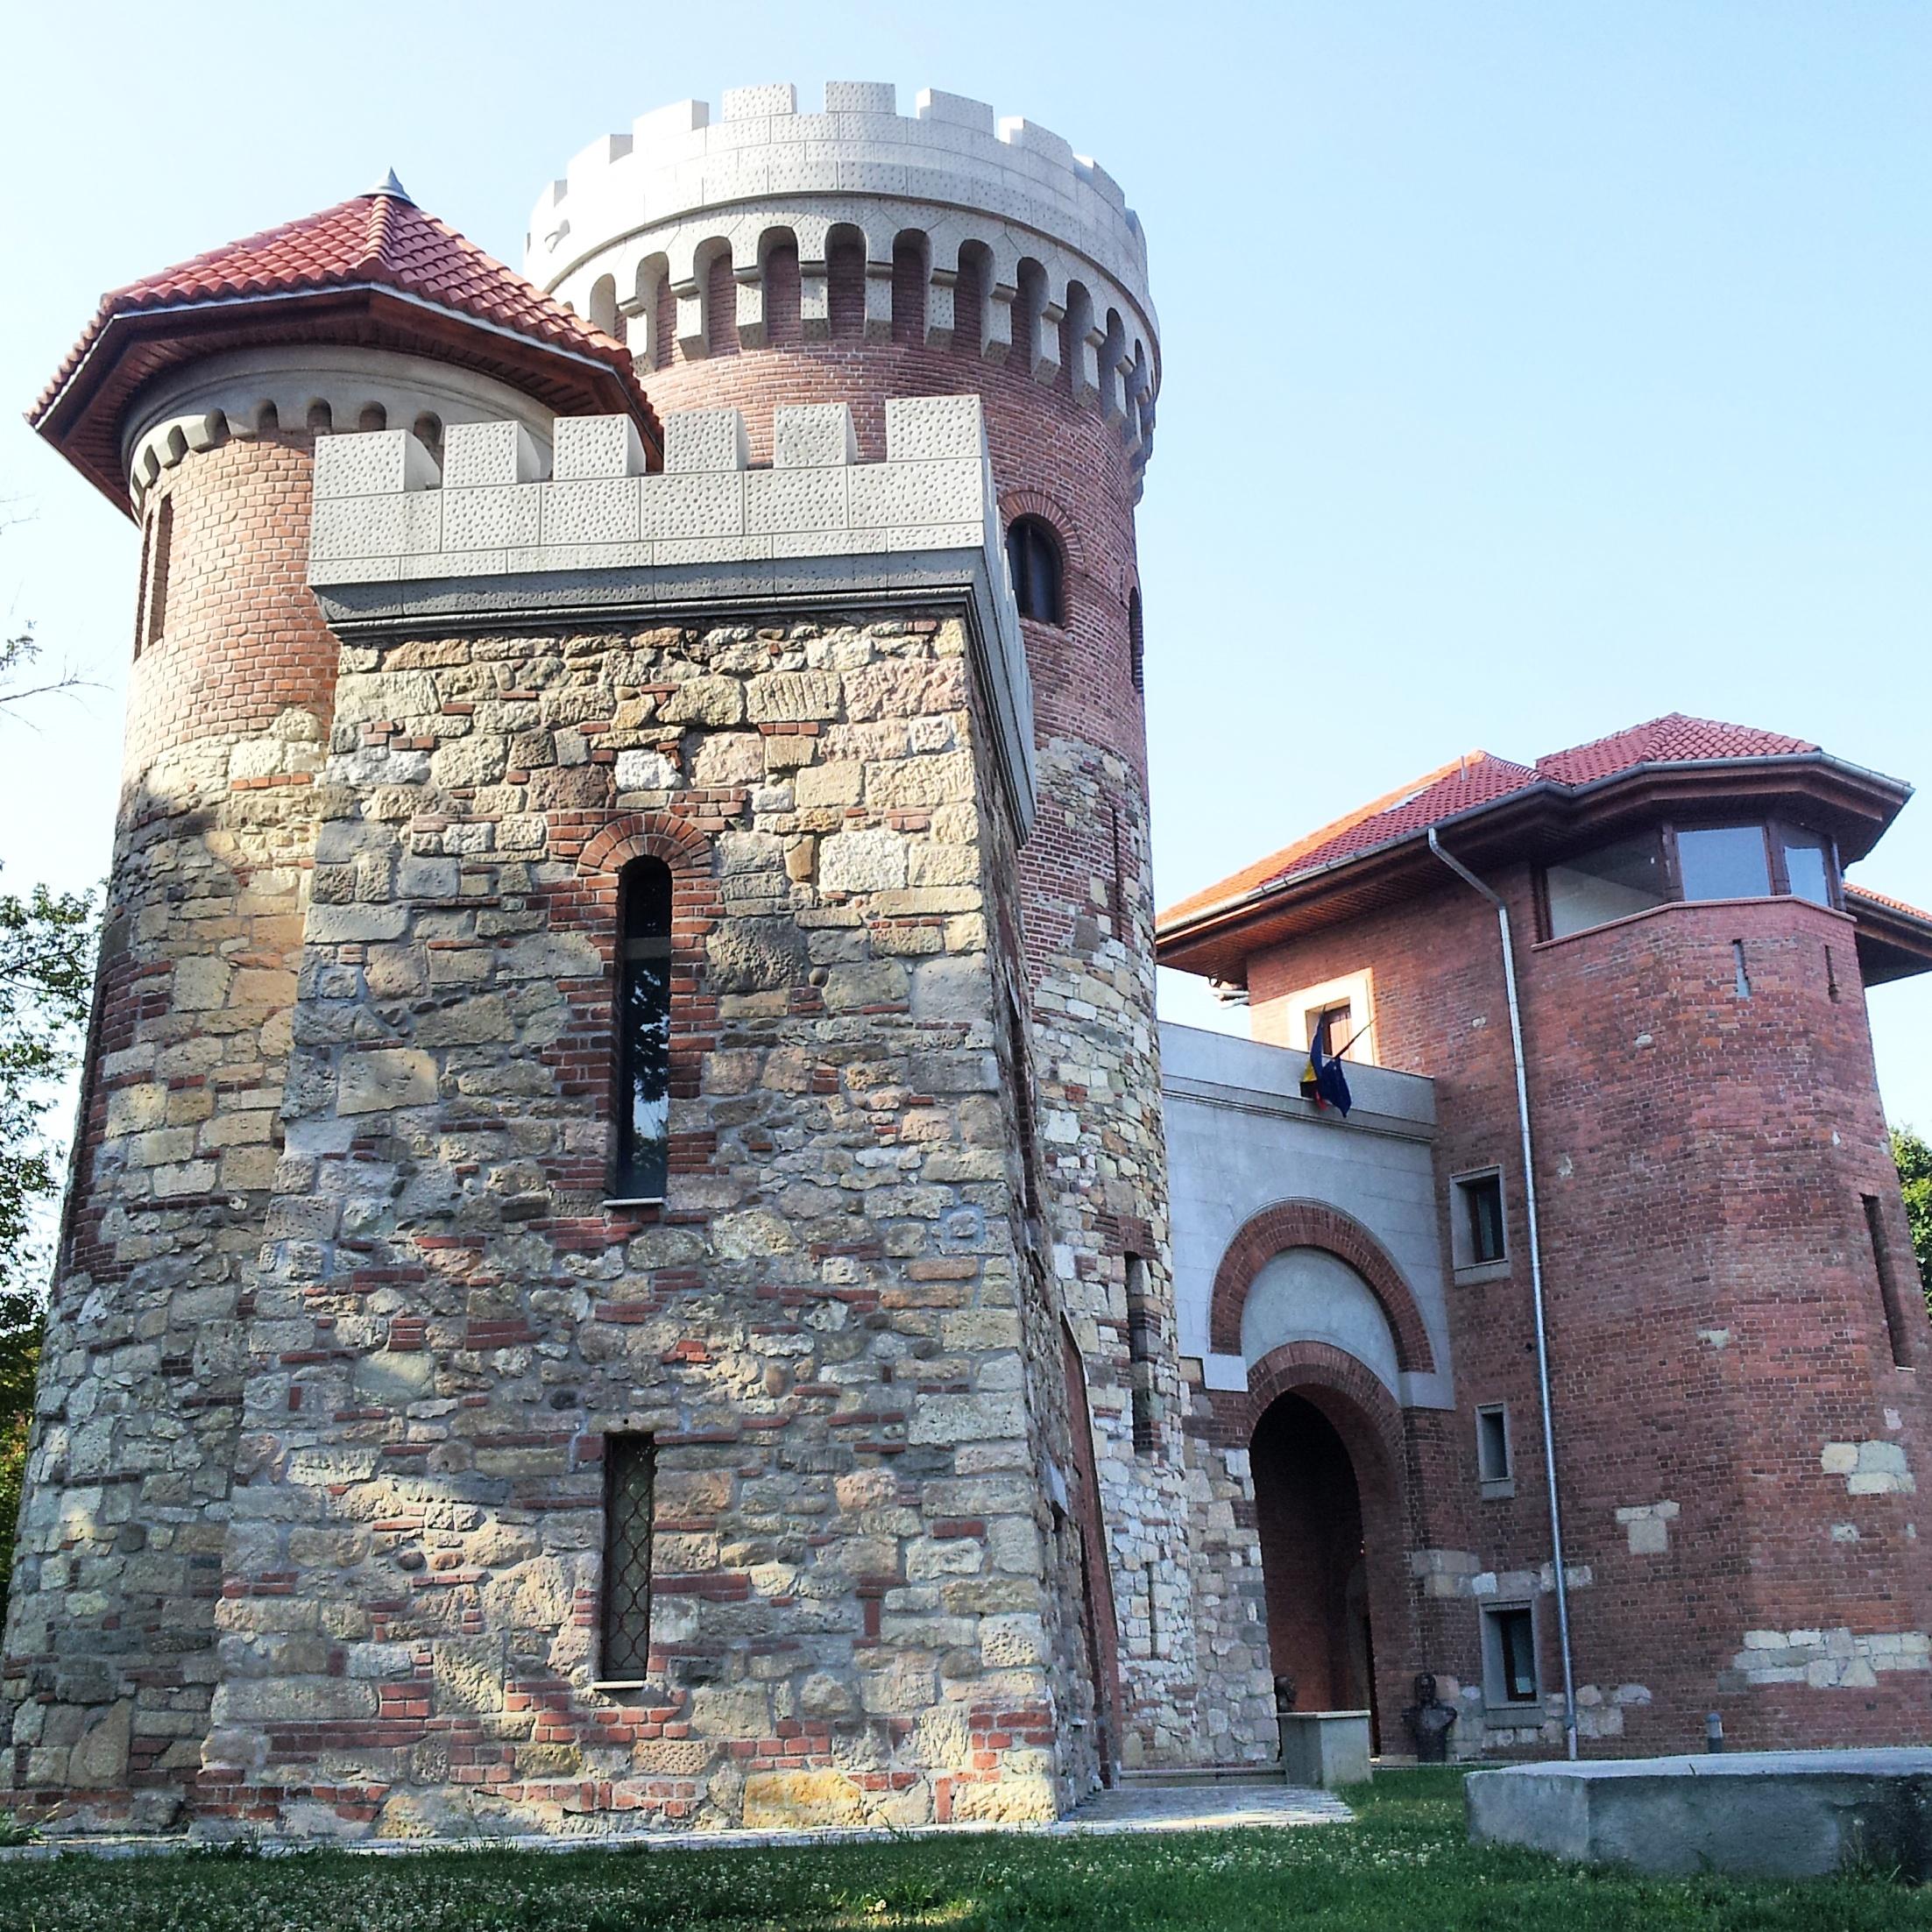 Vlad Tepes castle in Bucharest